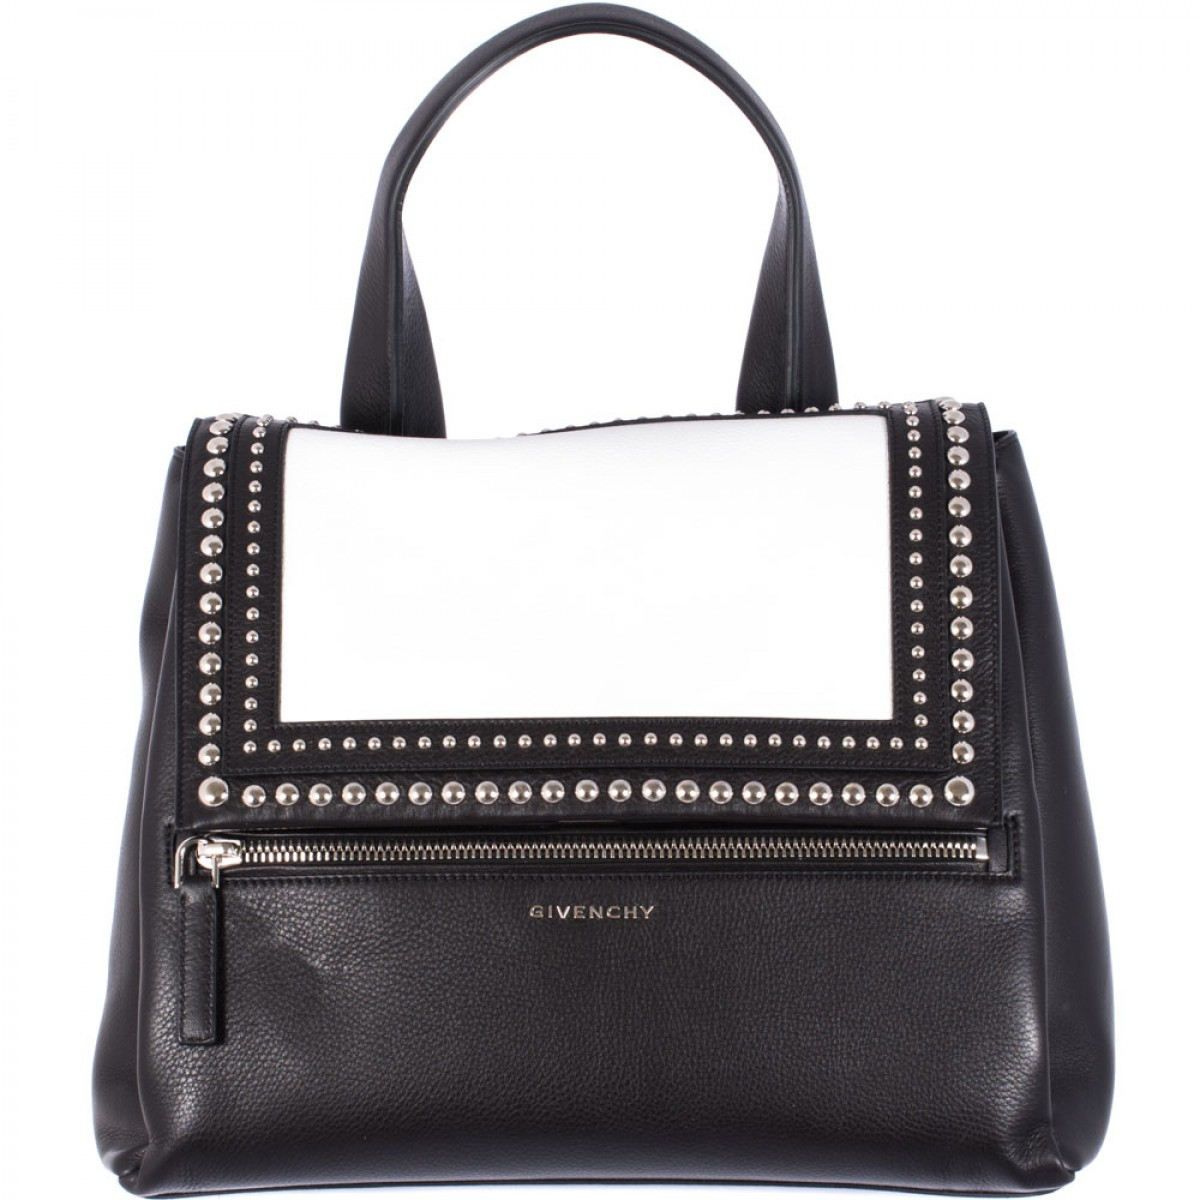 Givenchy Black And White Leather Pandora Pure Medium Bag ...